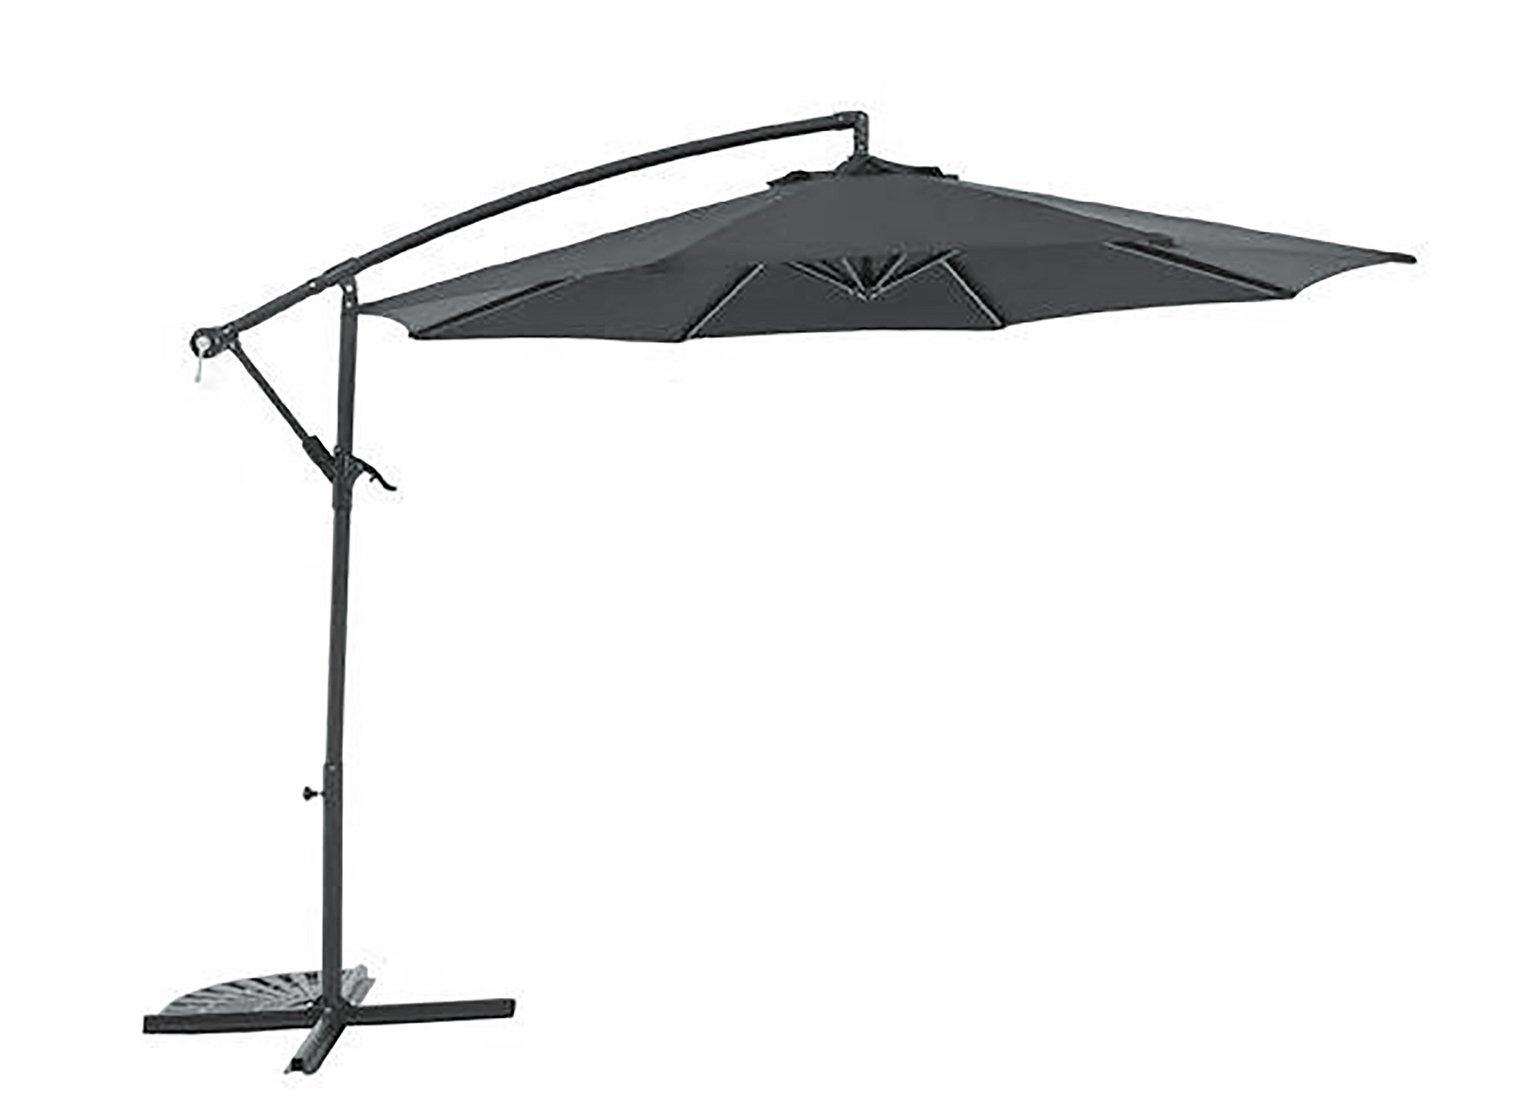 Argos Home 2.5m Overhanging Garden Parasol - Black